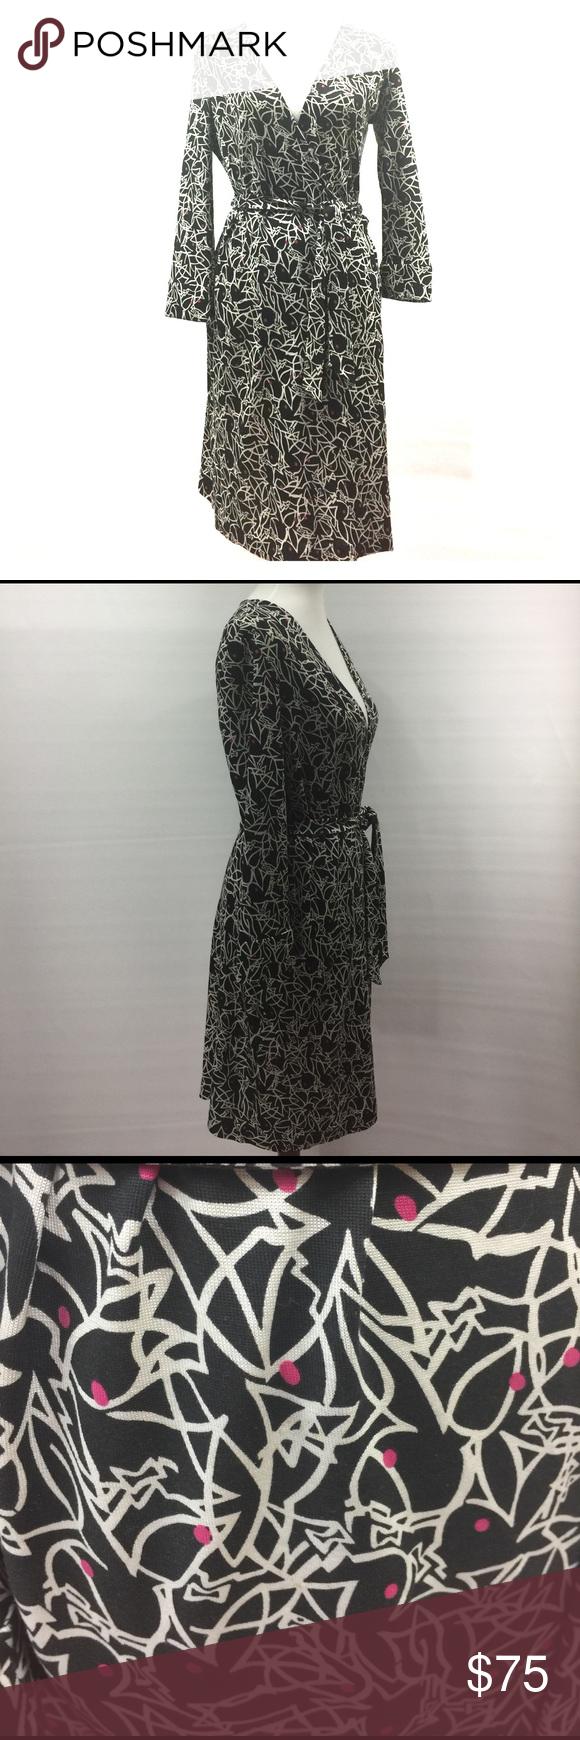 Sold Vintage Dvf Silk Bunny Print Wrap Dress Printed Wrap Dresses Silk Wrap Dresses Clothes Design [ 1740 x 580 Pixel ]